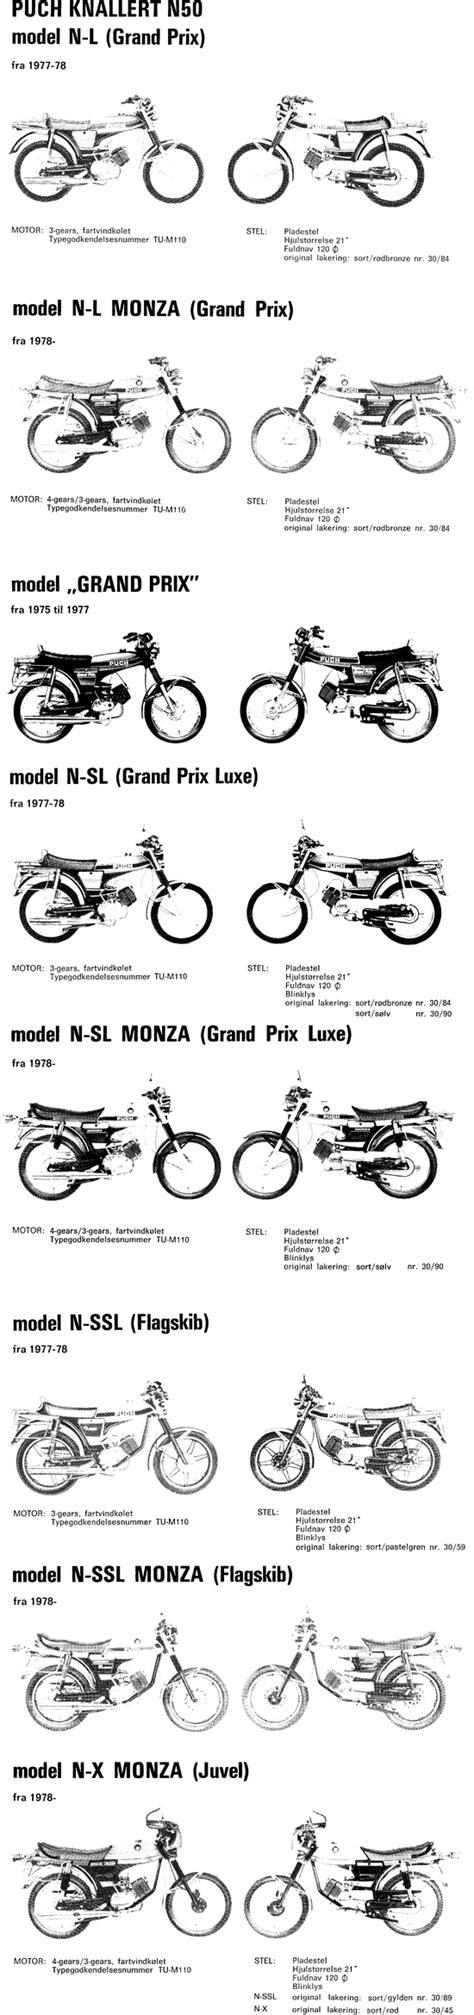 Moeza Maxi by Puch Knallerter Med 50 Cm 179 Motor